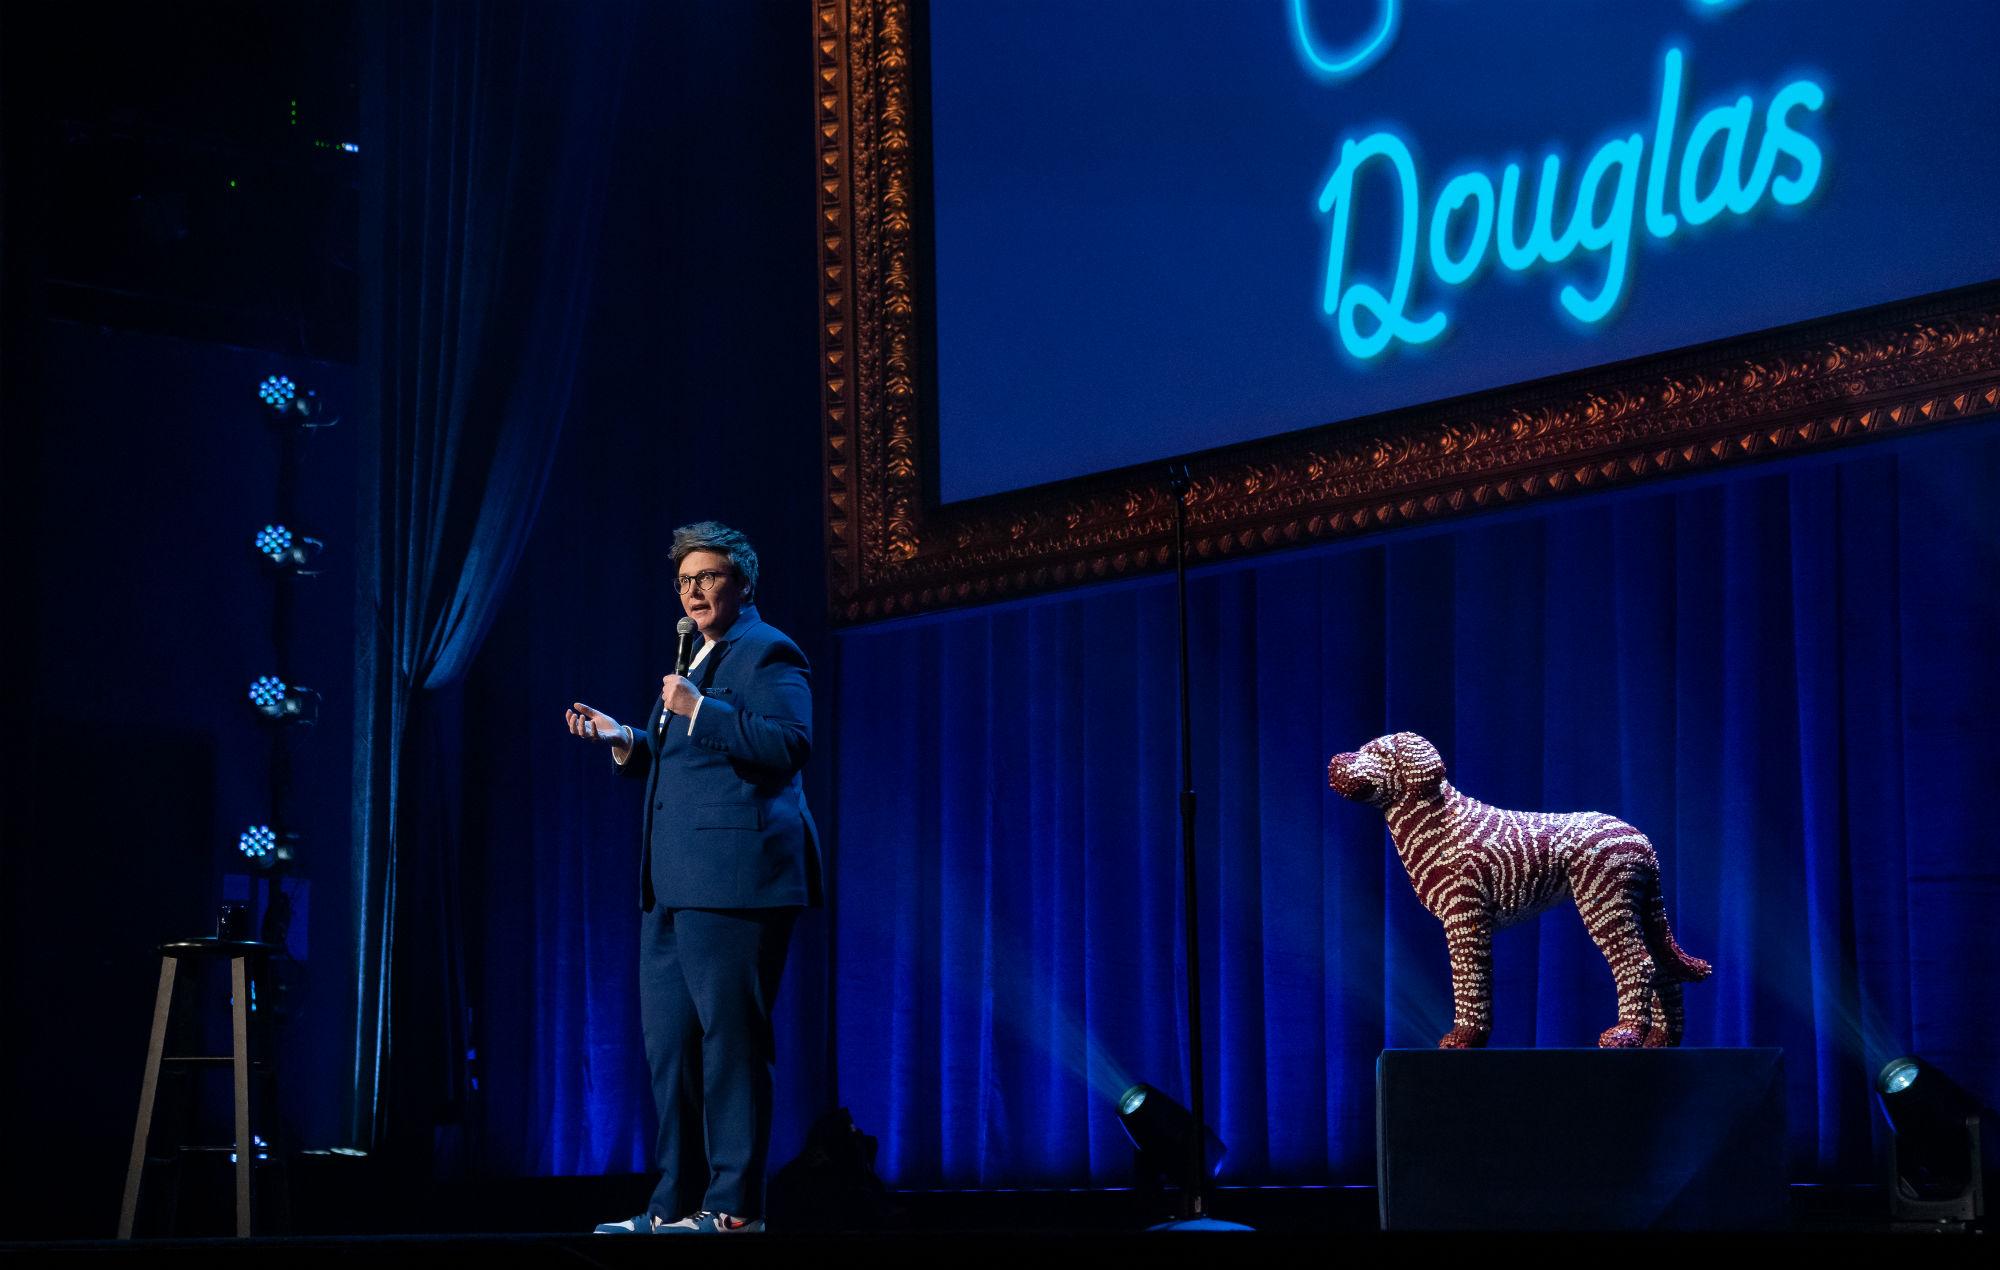 Hannah Gadsby's new show 'Douglas'